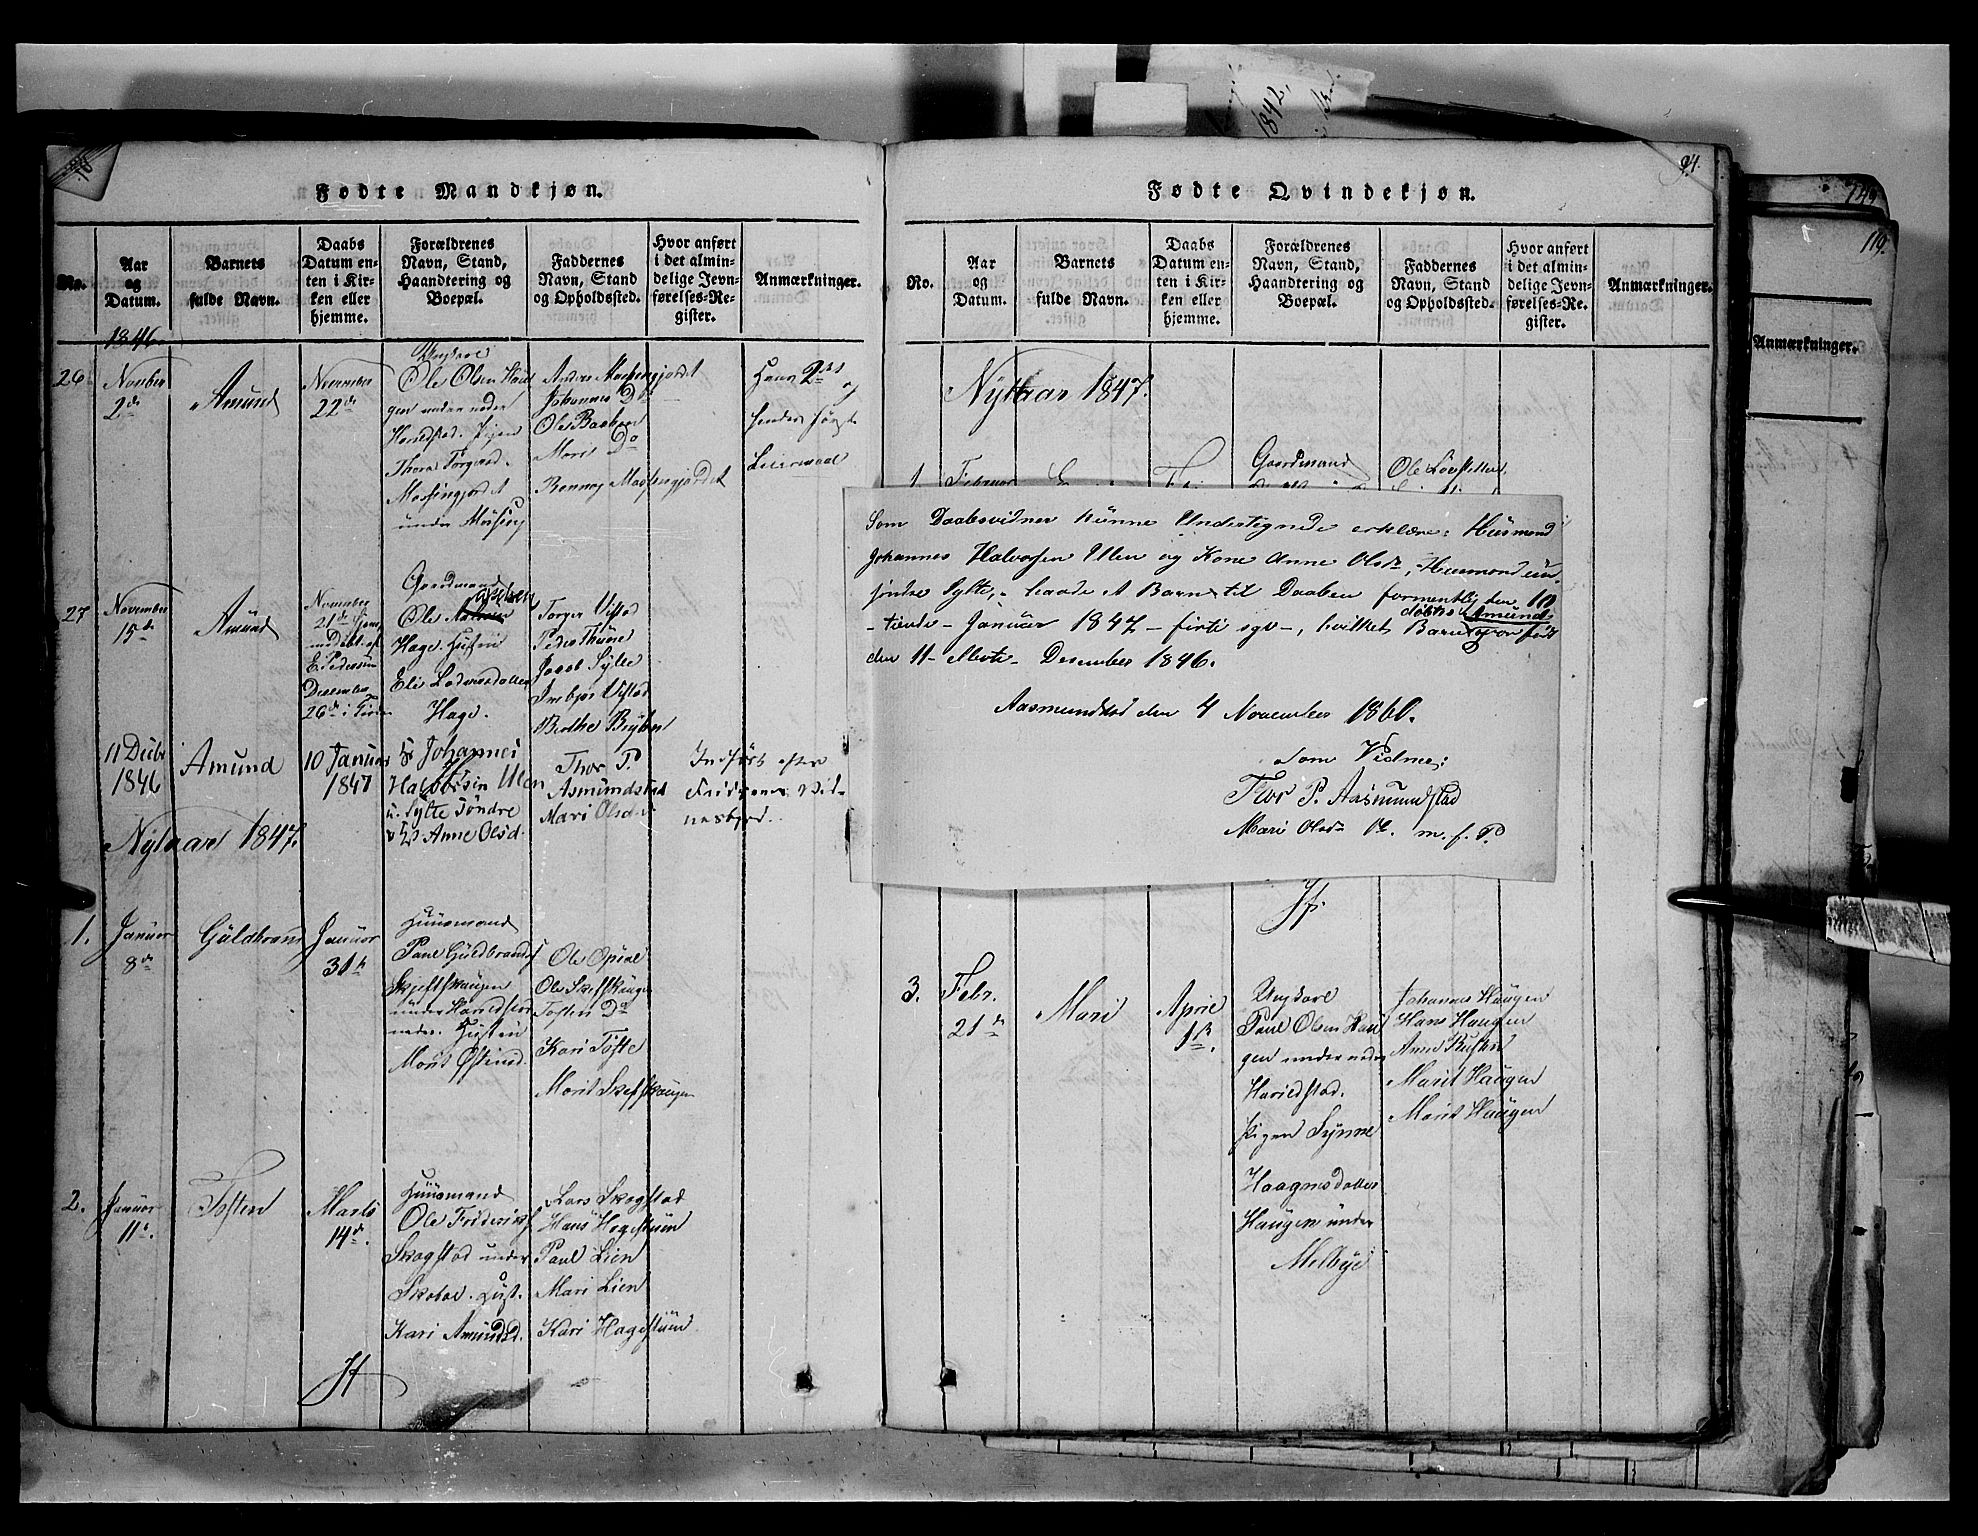 SAH, Fron prestekontor, H/Ha/Hab/L0003: Klokkerbok nr. 3, 1816-1850, s. 92